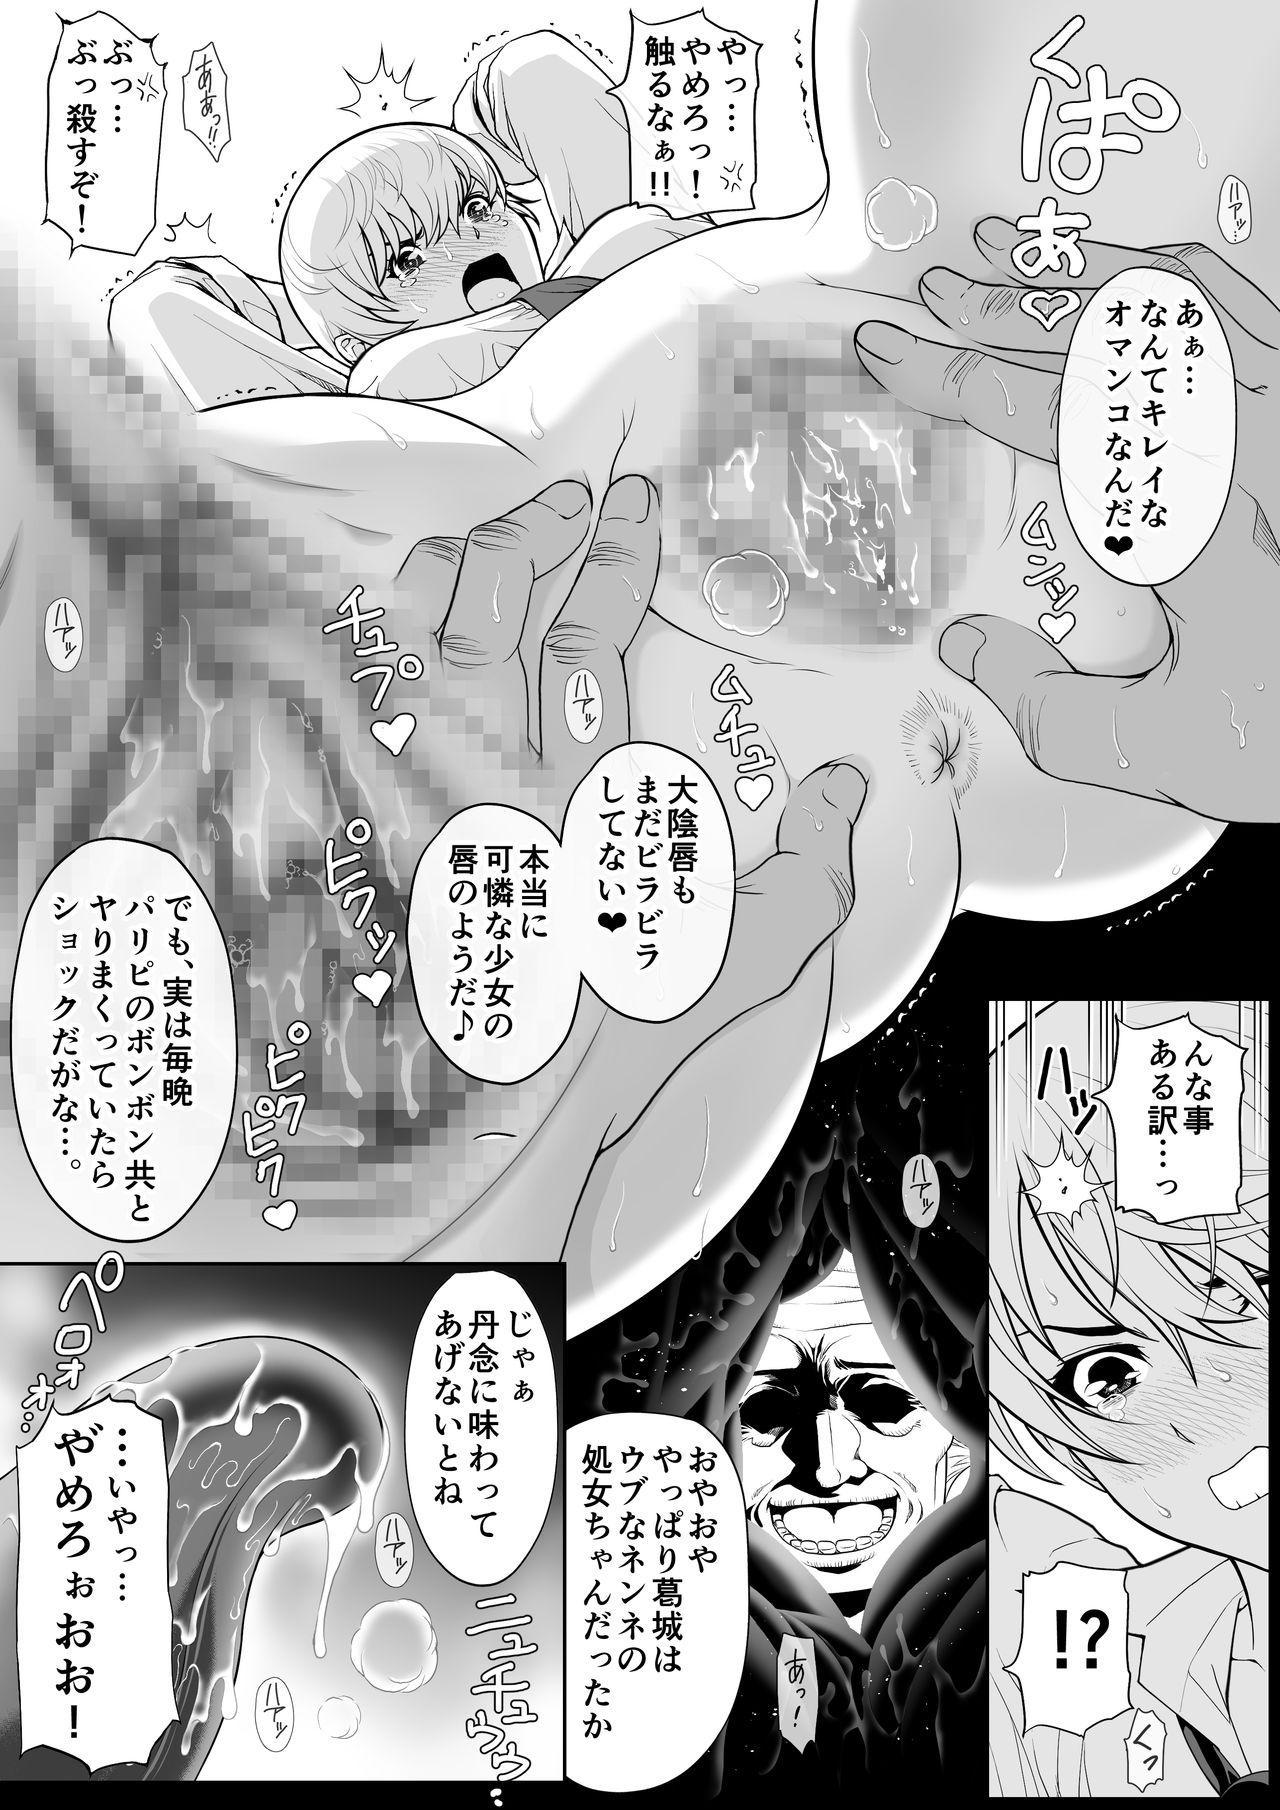 Namaiki mmusume ni tsuyo ● ikīki jugyō 13